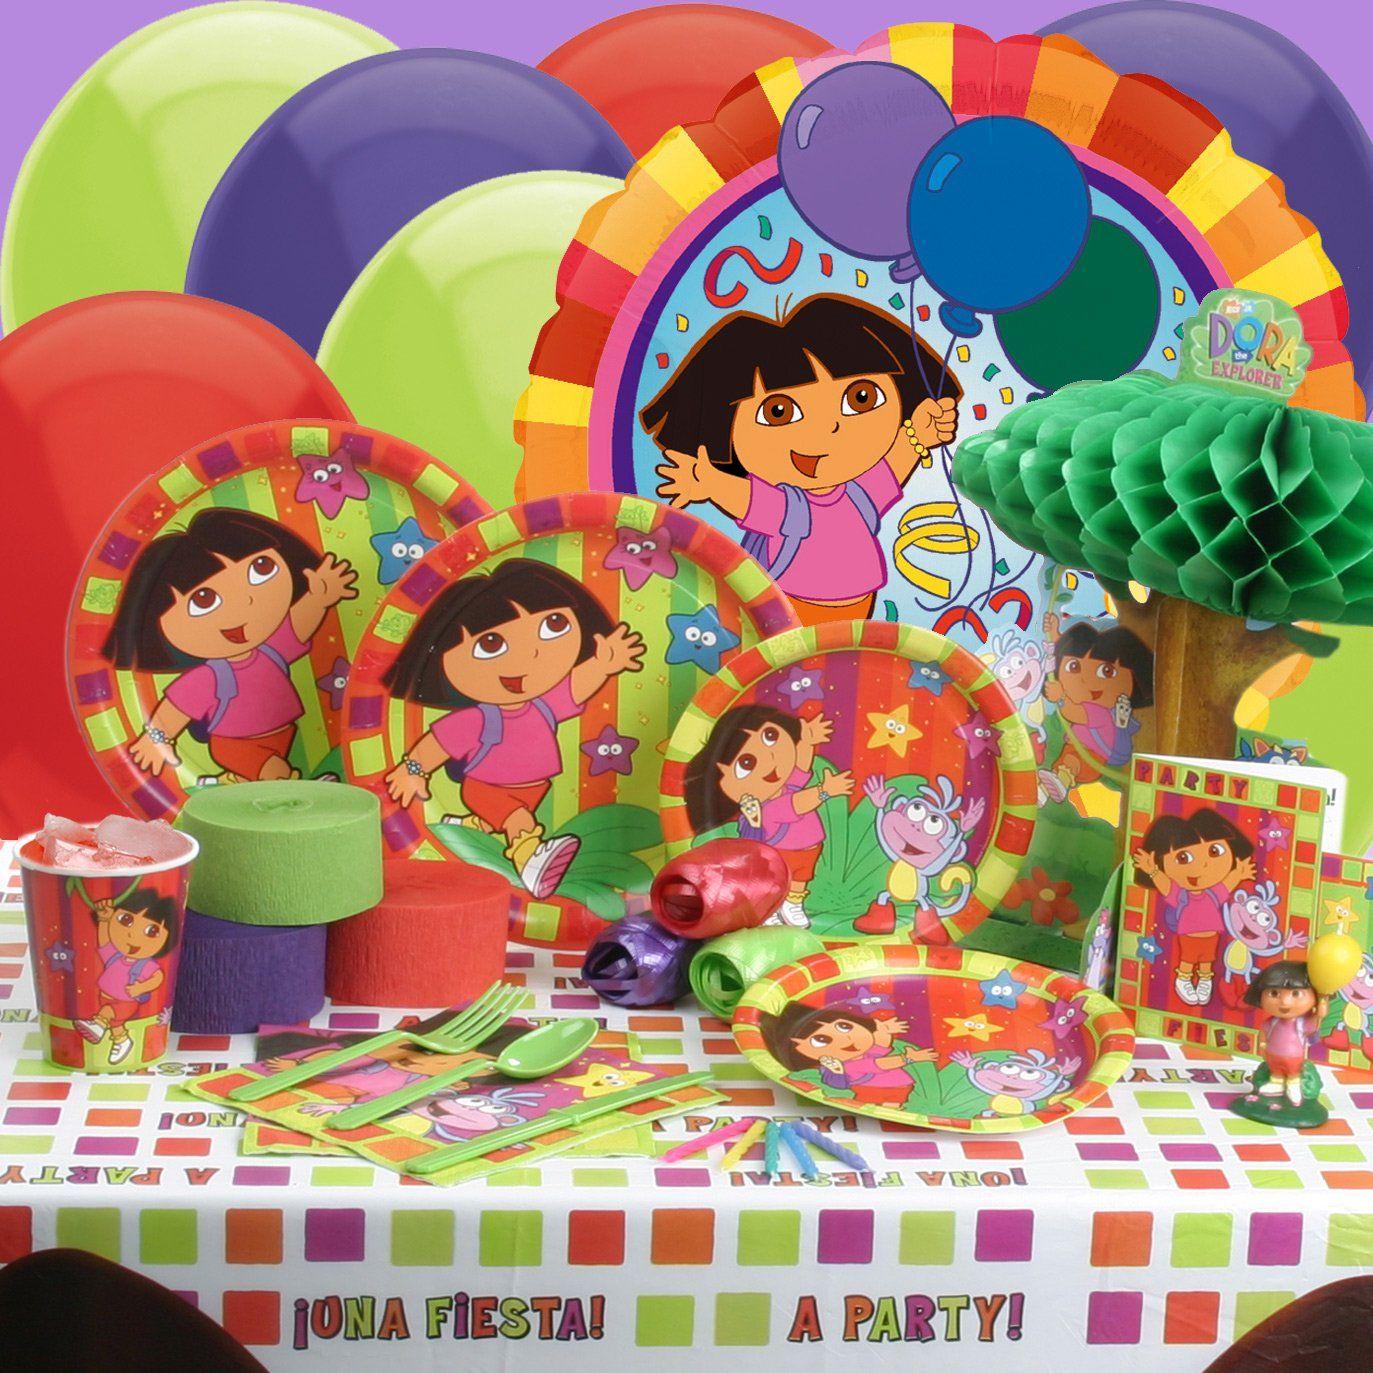 Google themes explorer - Dora The Explorer Birthday Party Photos Pictures Images